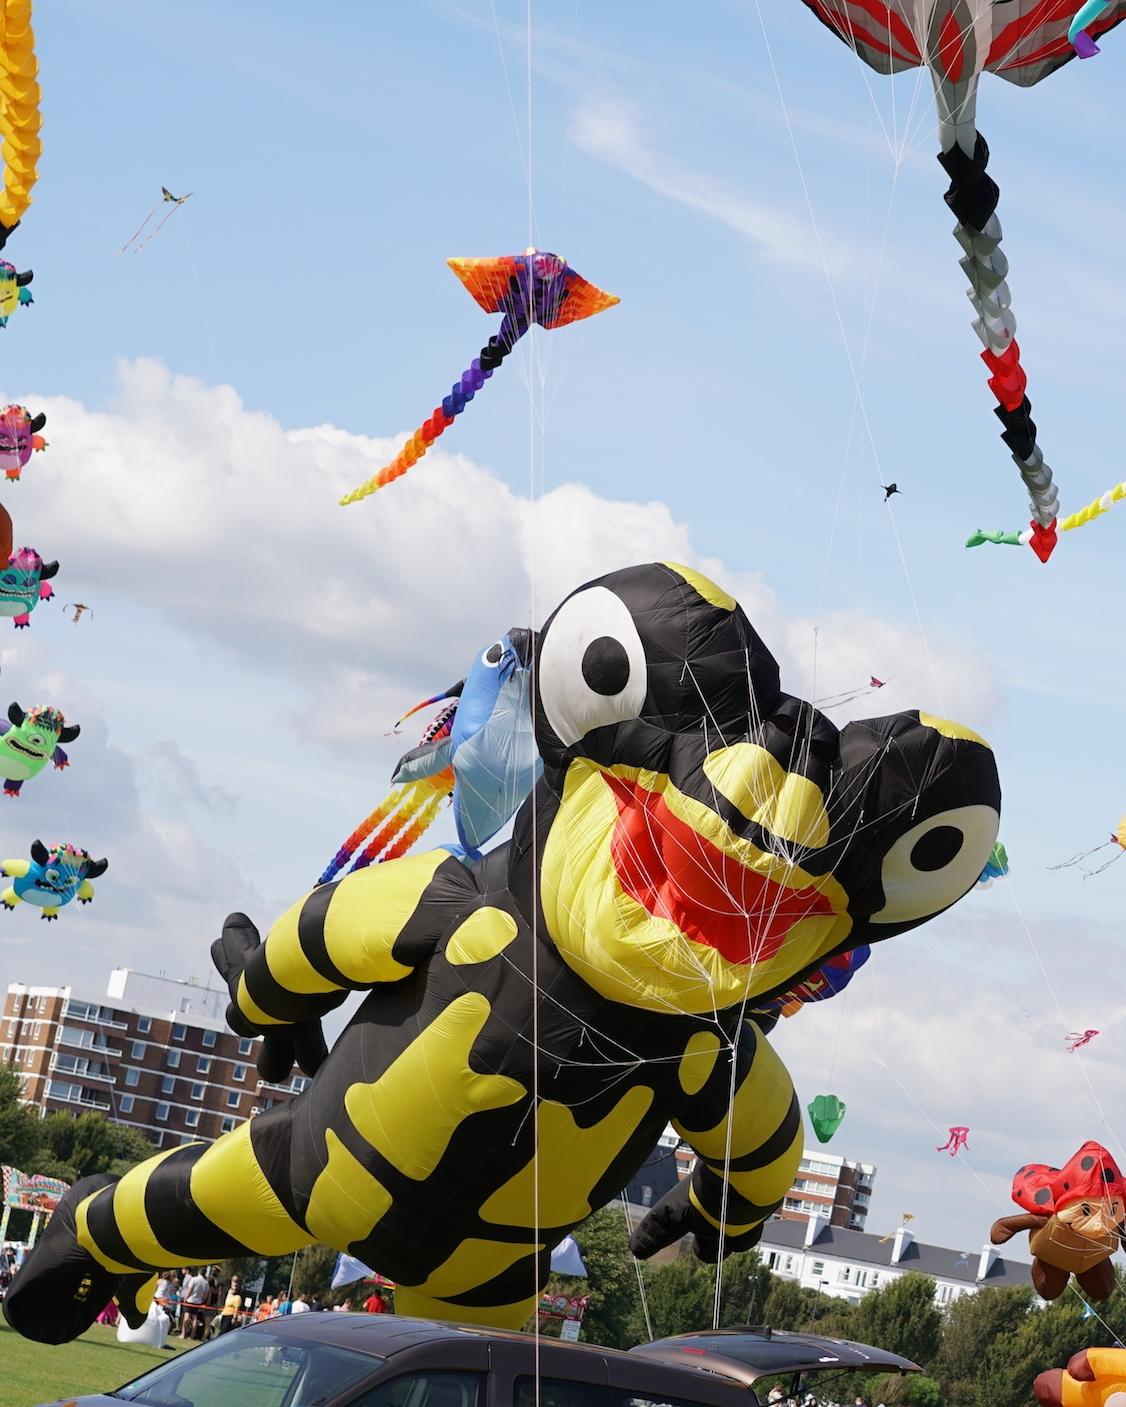 Portsmouth International Kite Festival 2018